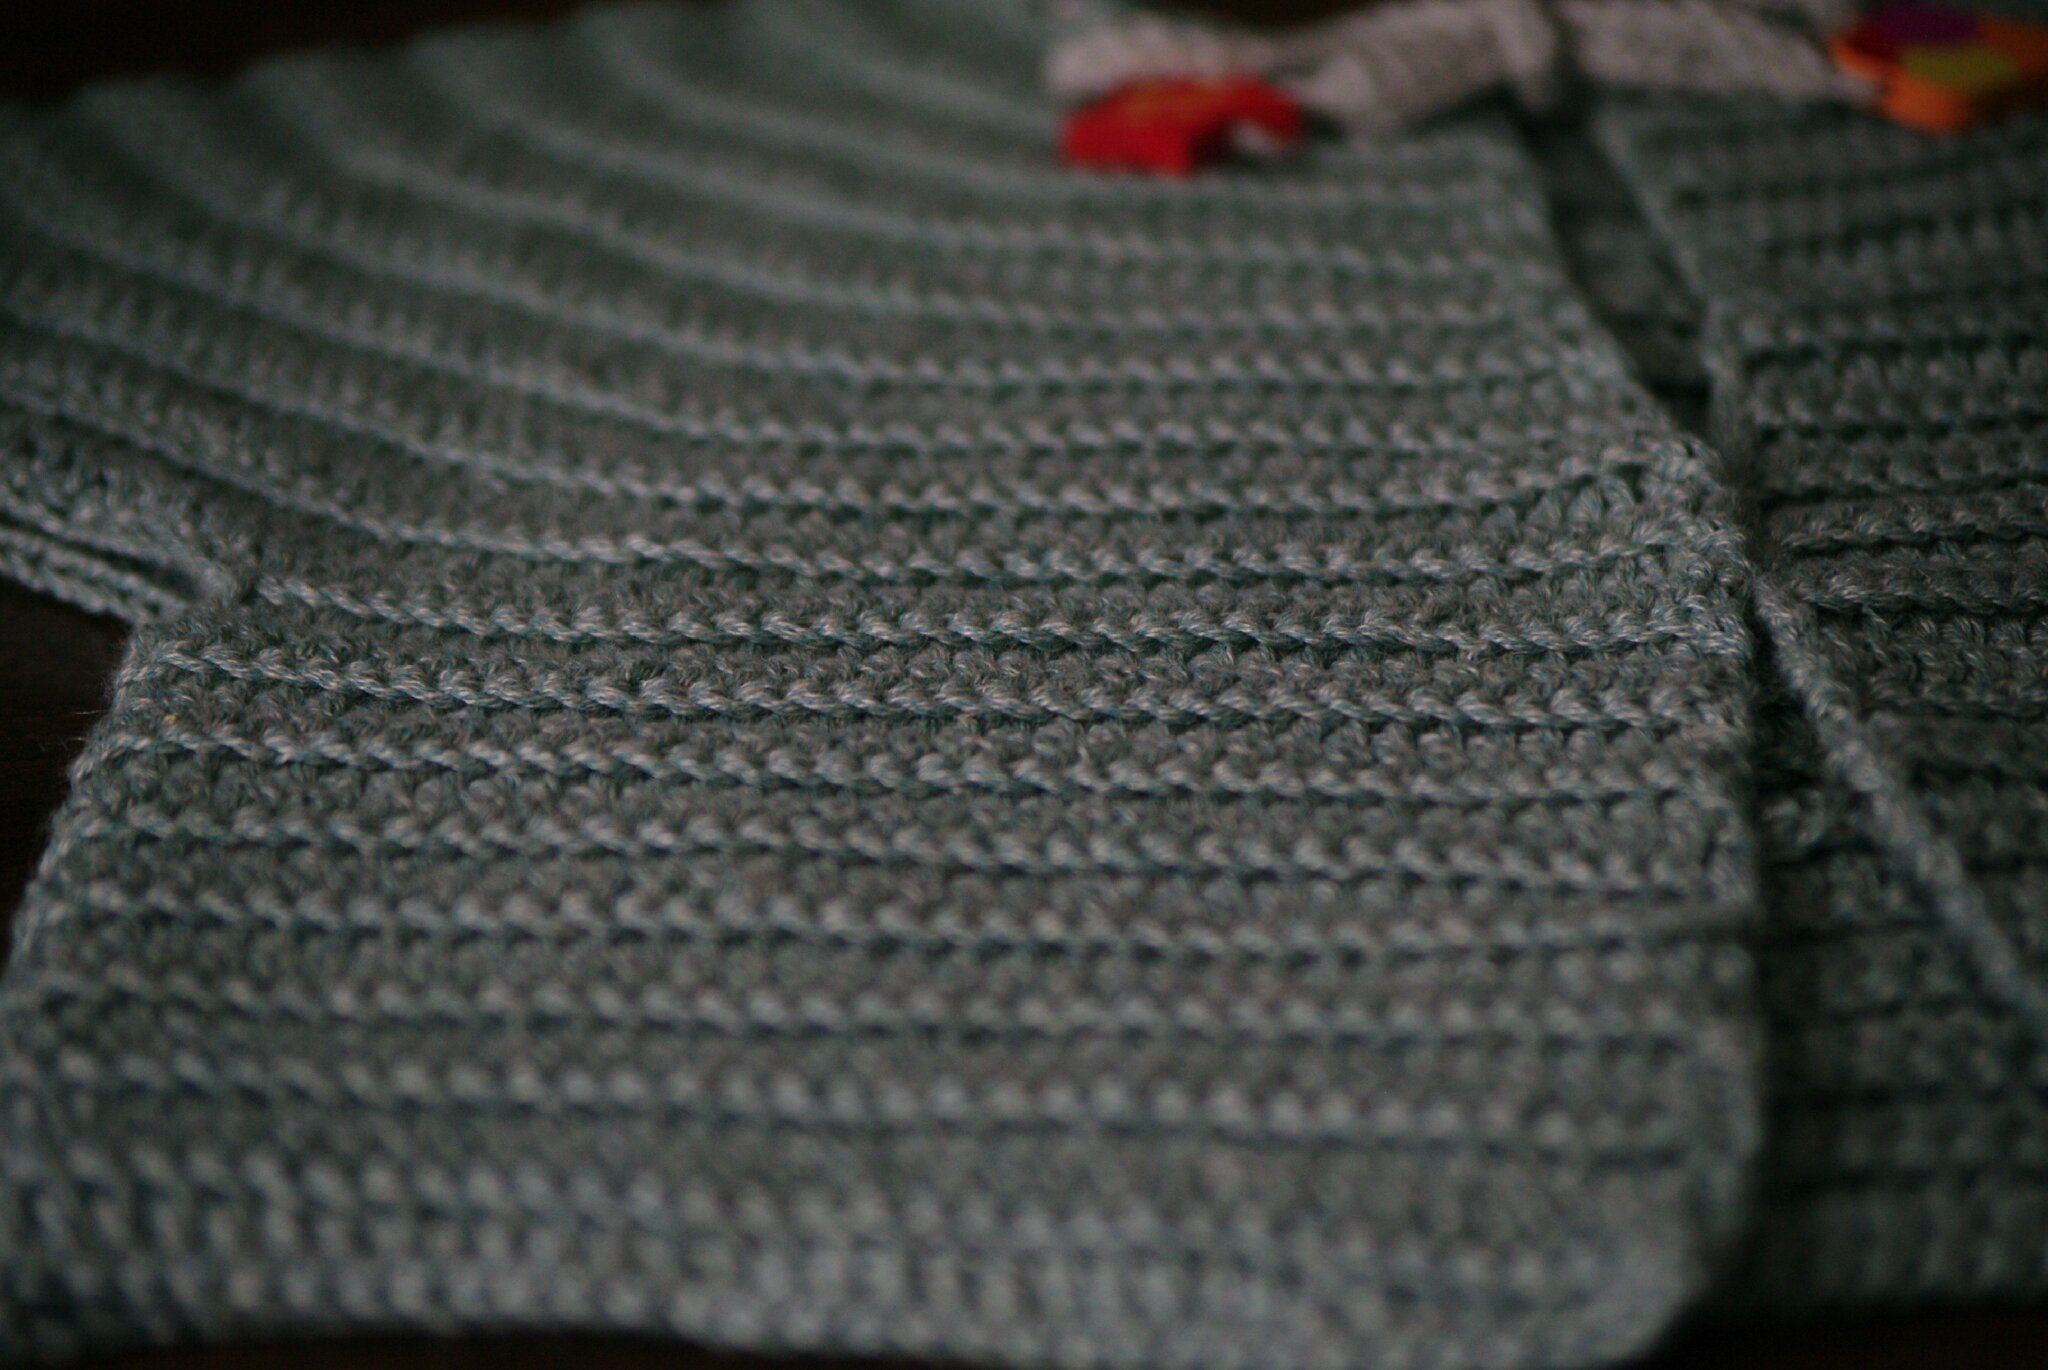 crocheter un gilet rond top-down